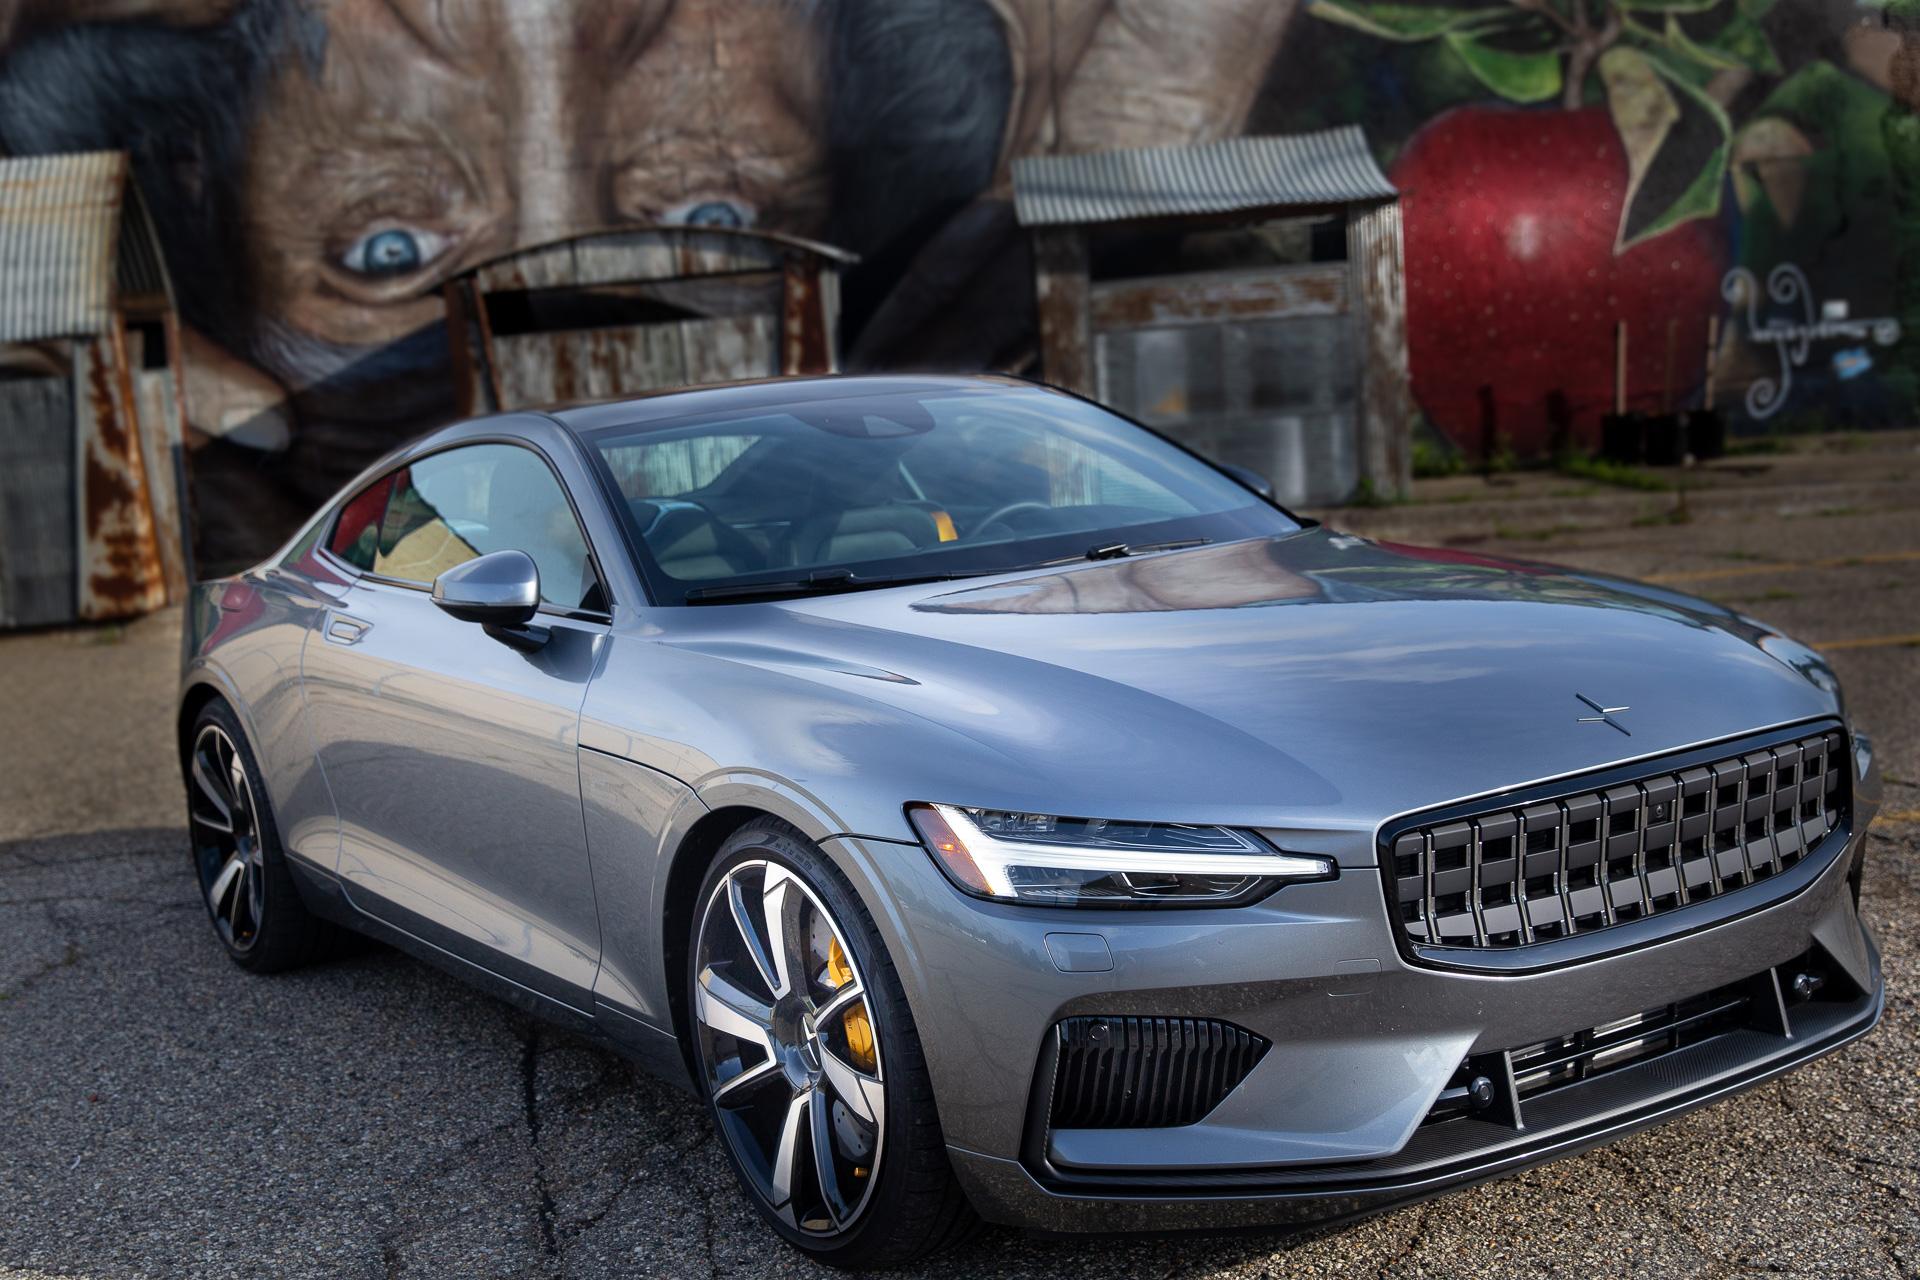 Polestar built a better car than Tesla; now it needs to